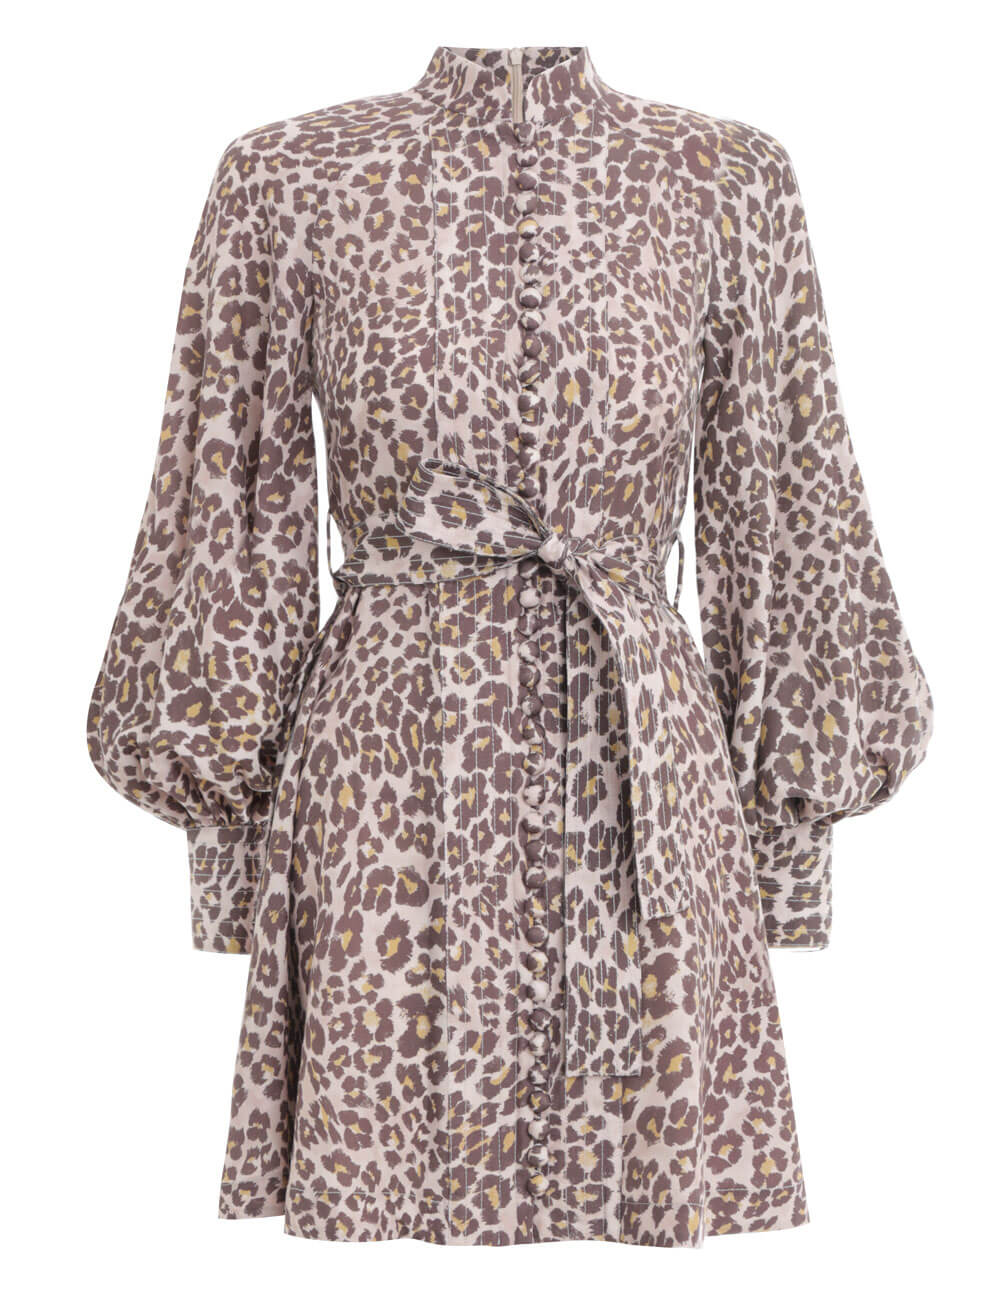 9fca01b6420c4 Shop Designer Dresses Online | ZIMMERMANN